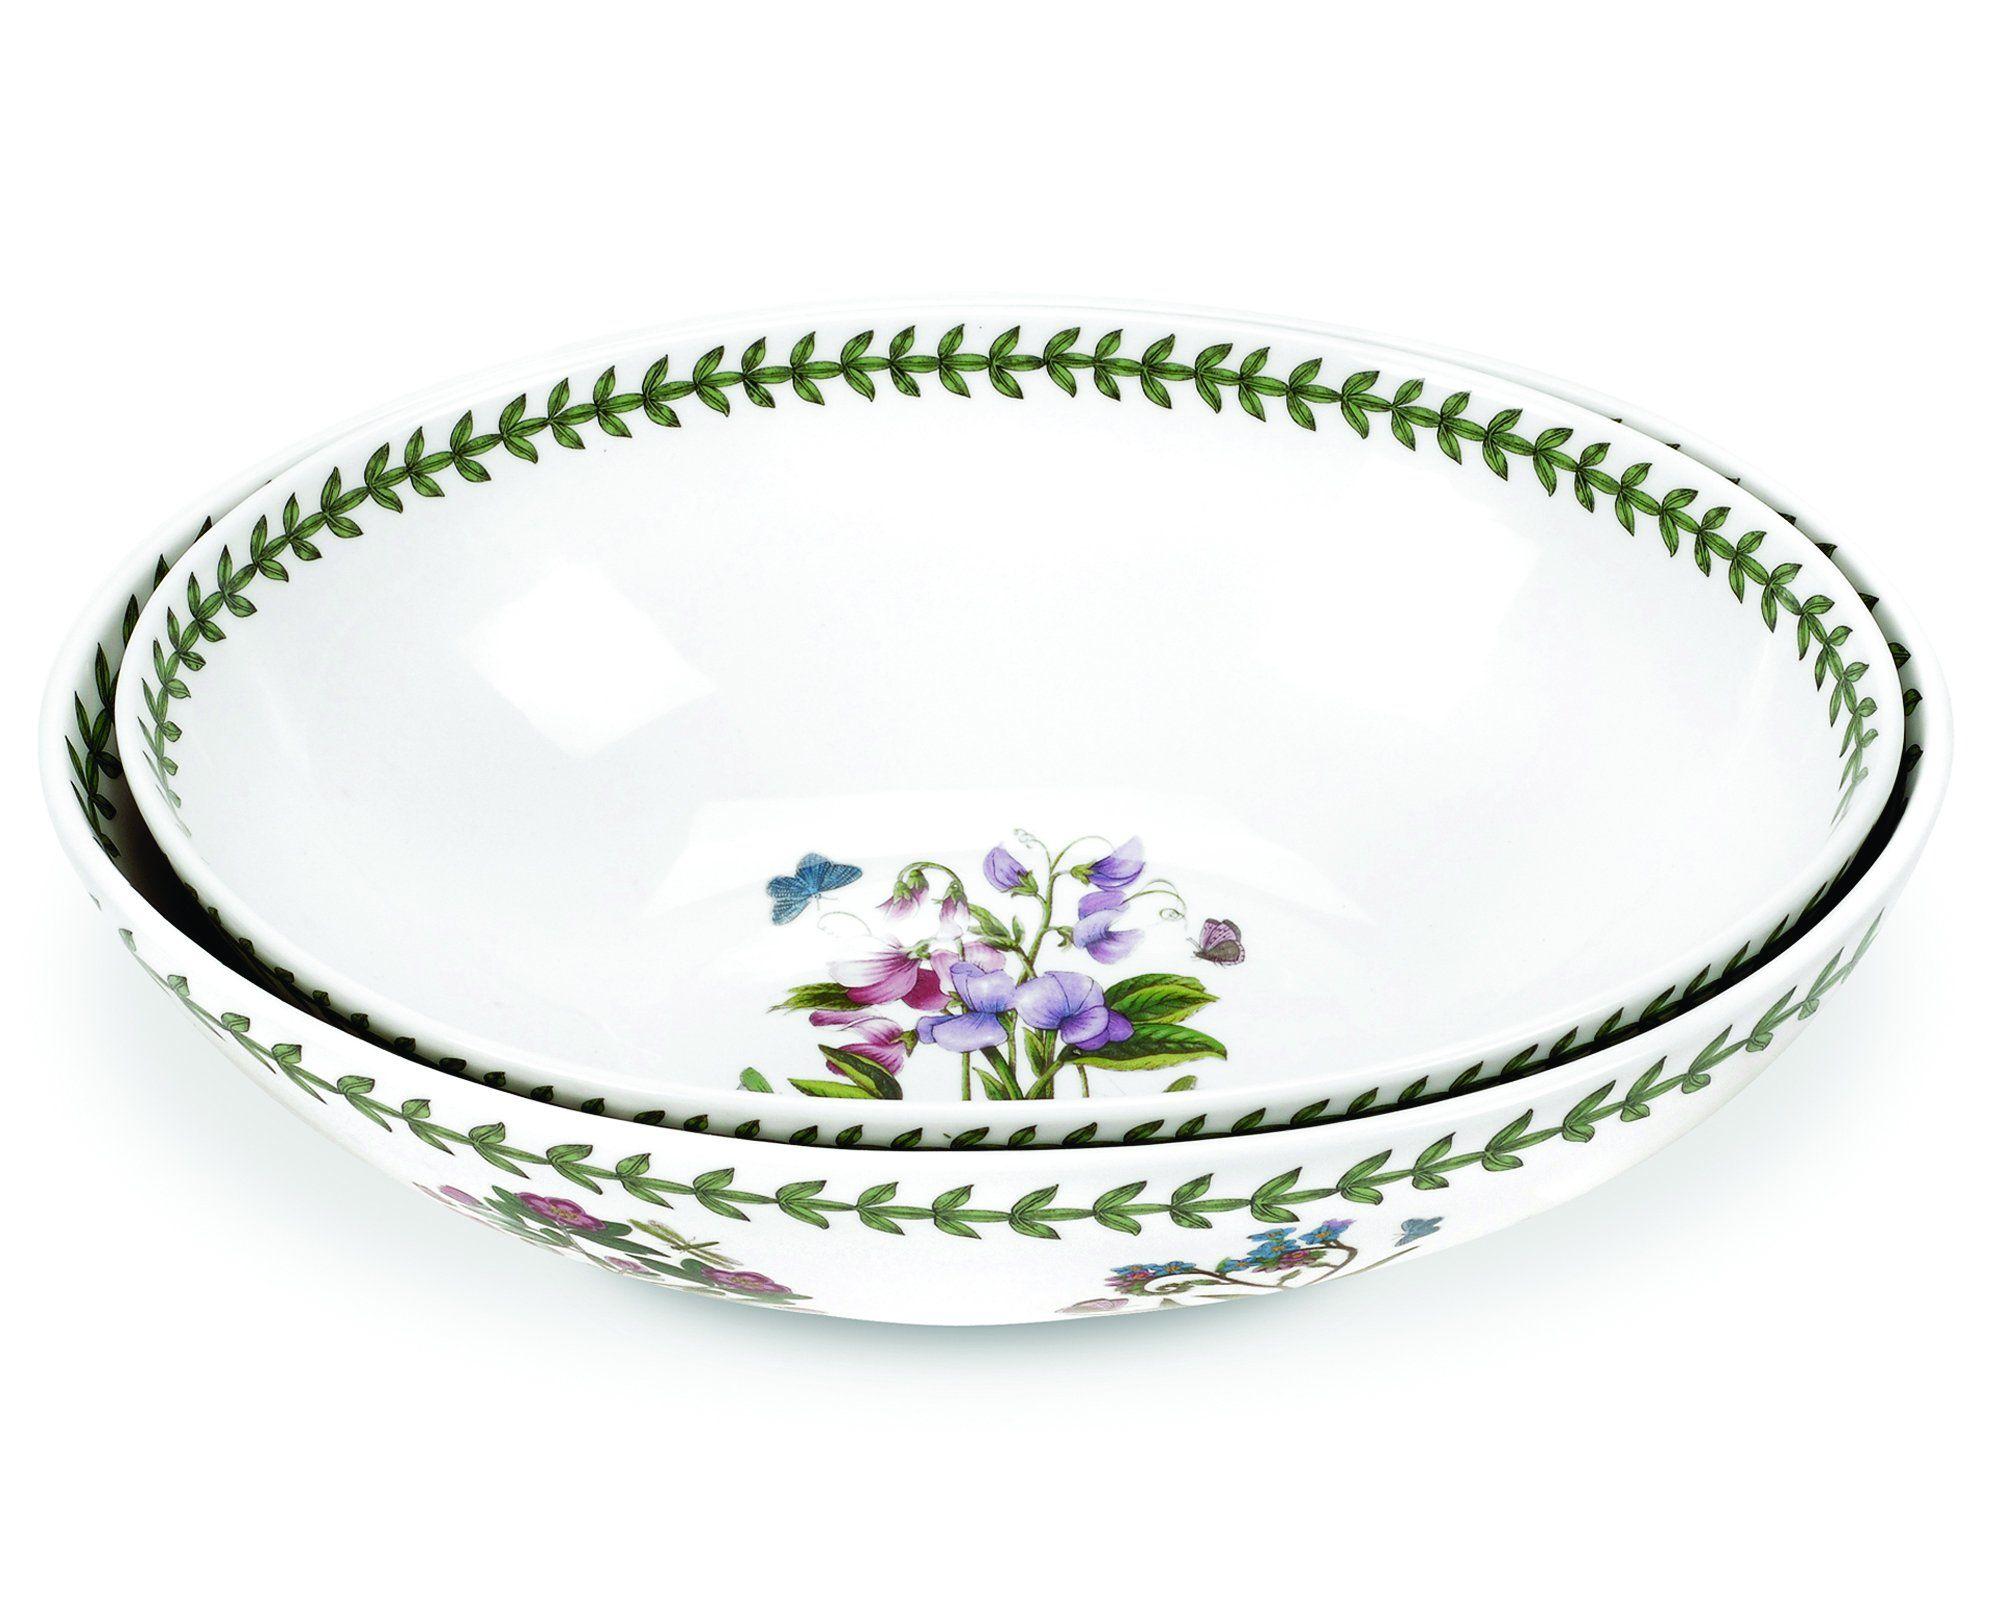 Portmeirion Botanic Garden Oval Nesting Bowls, Set of 2